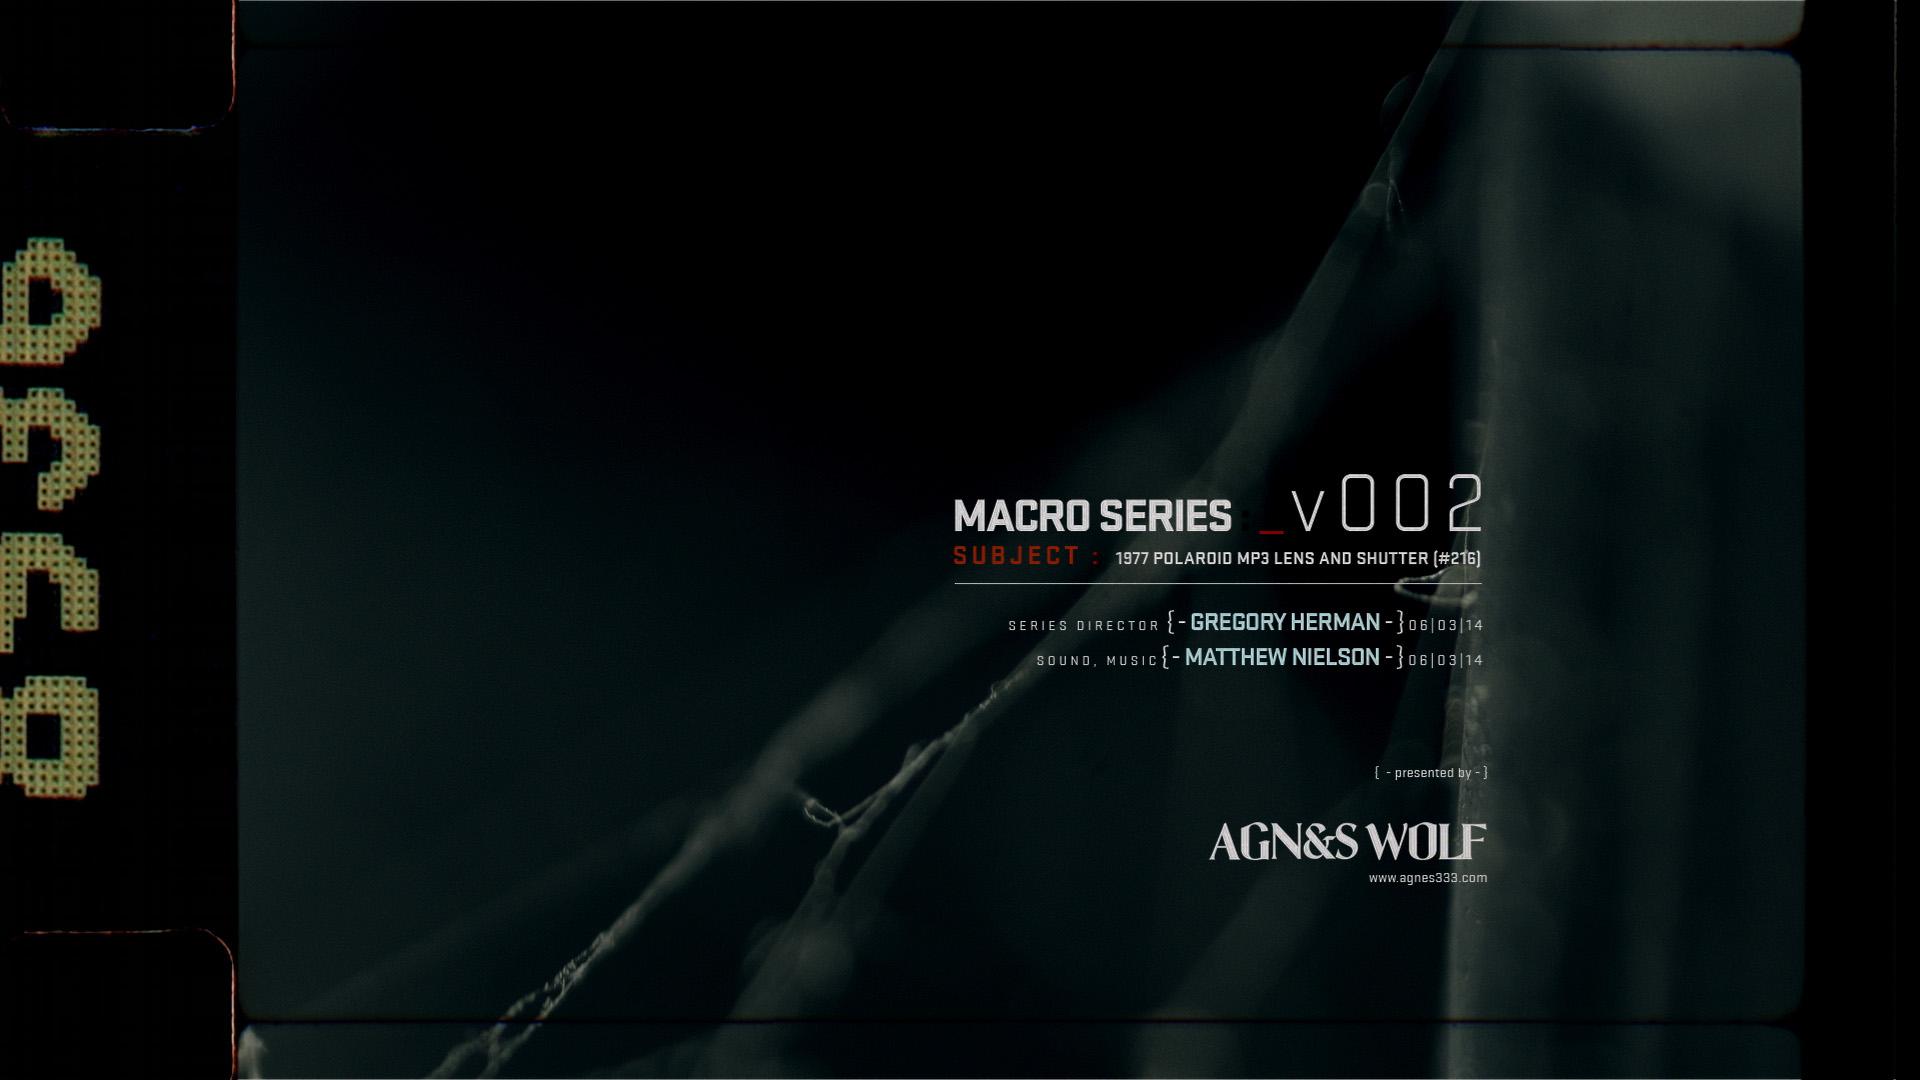 02_macro_series_v2_0a.jpg